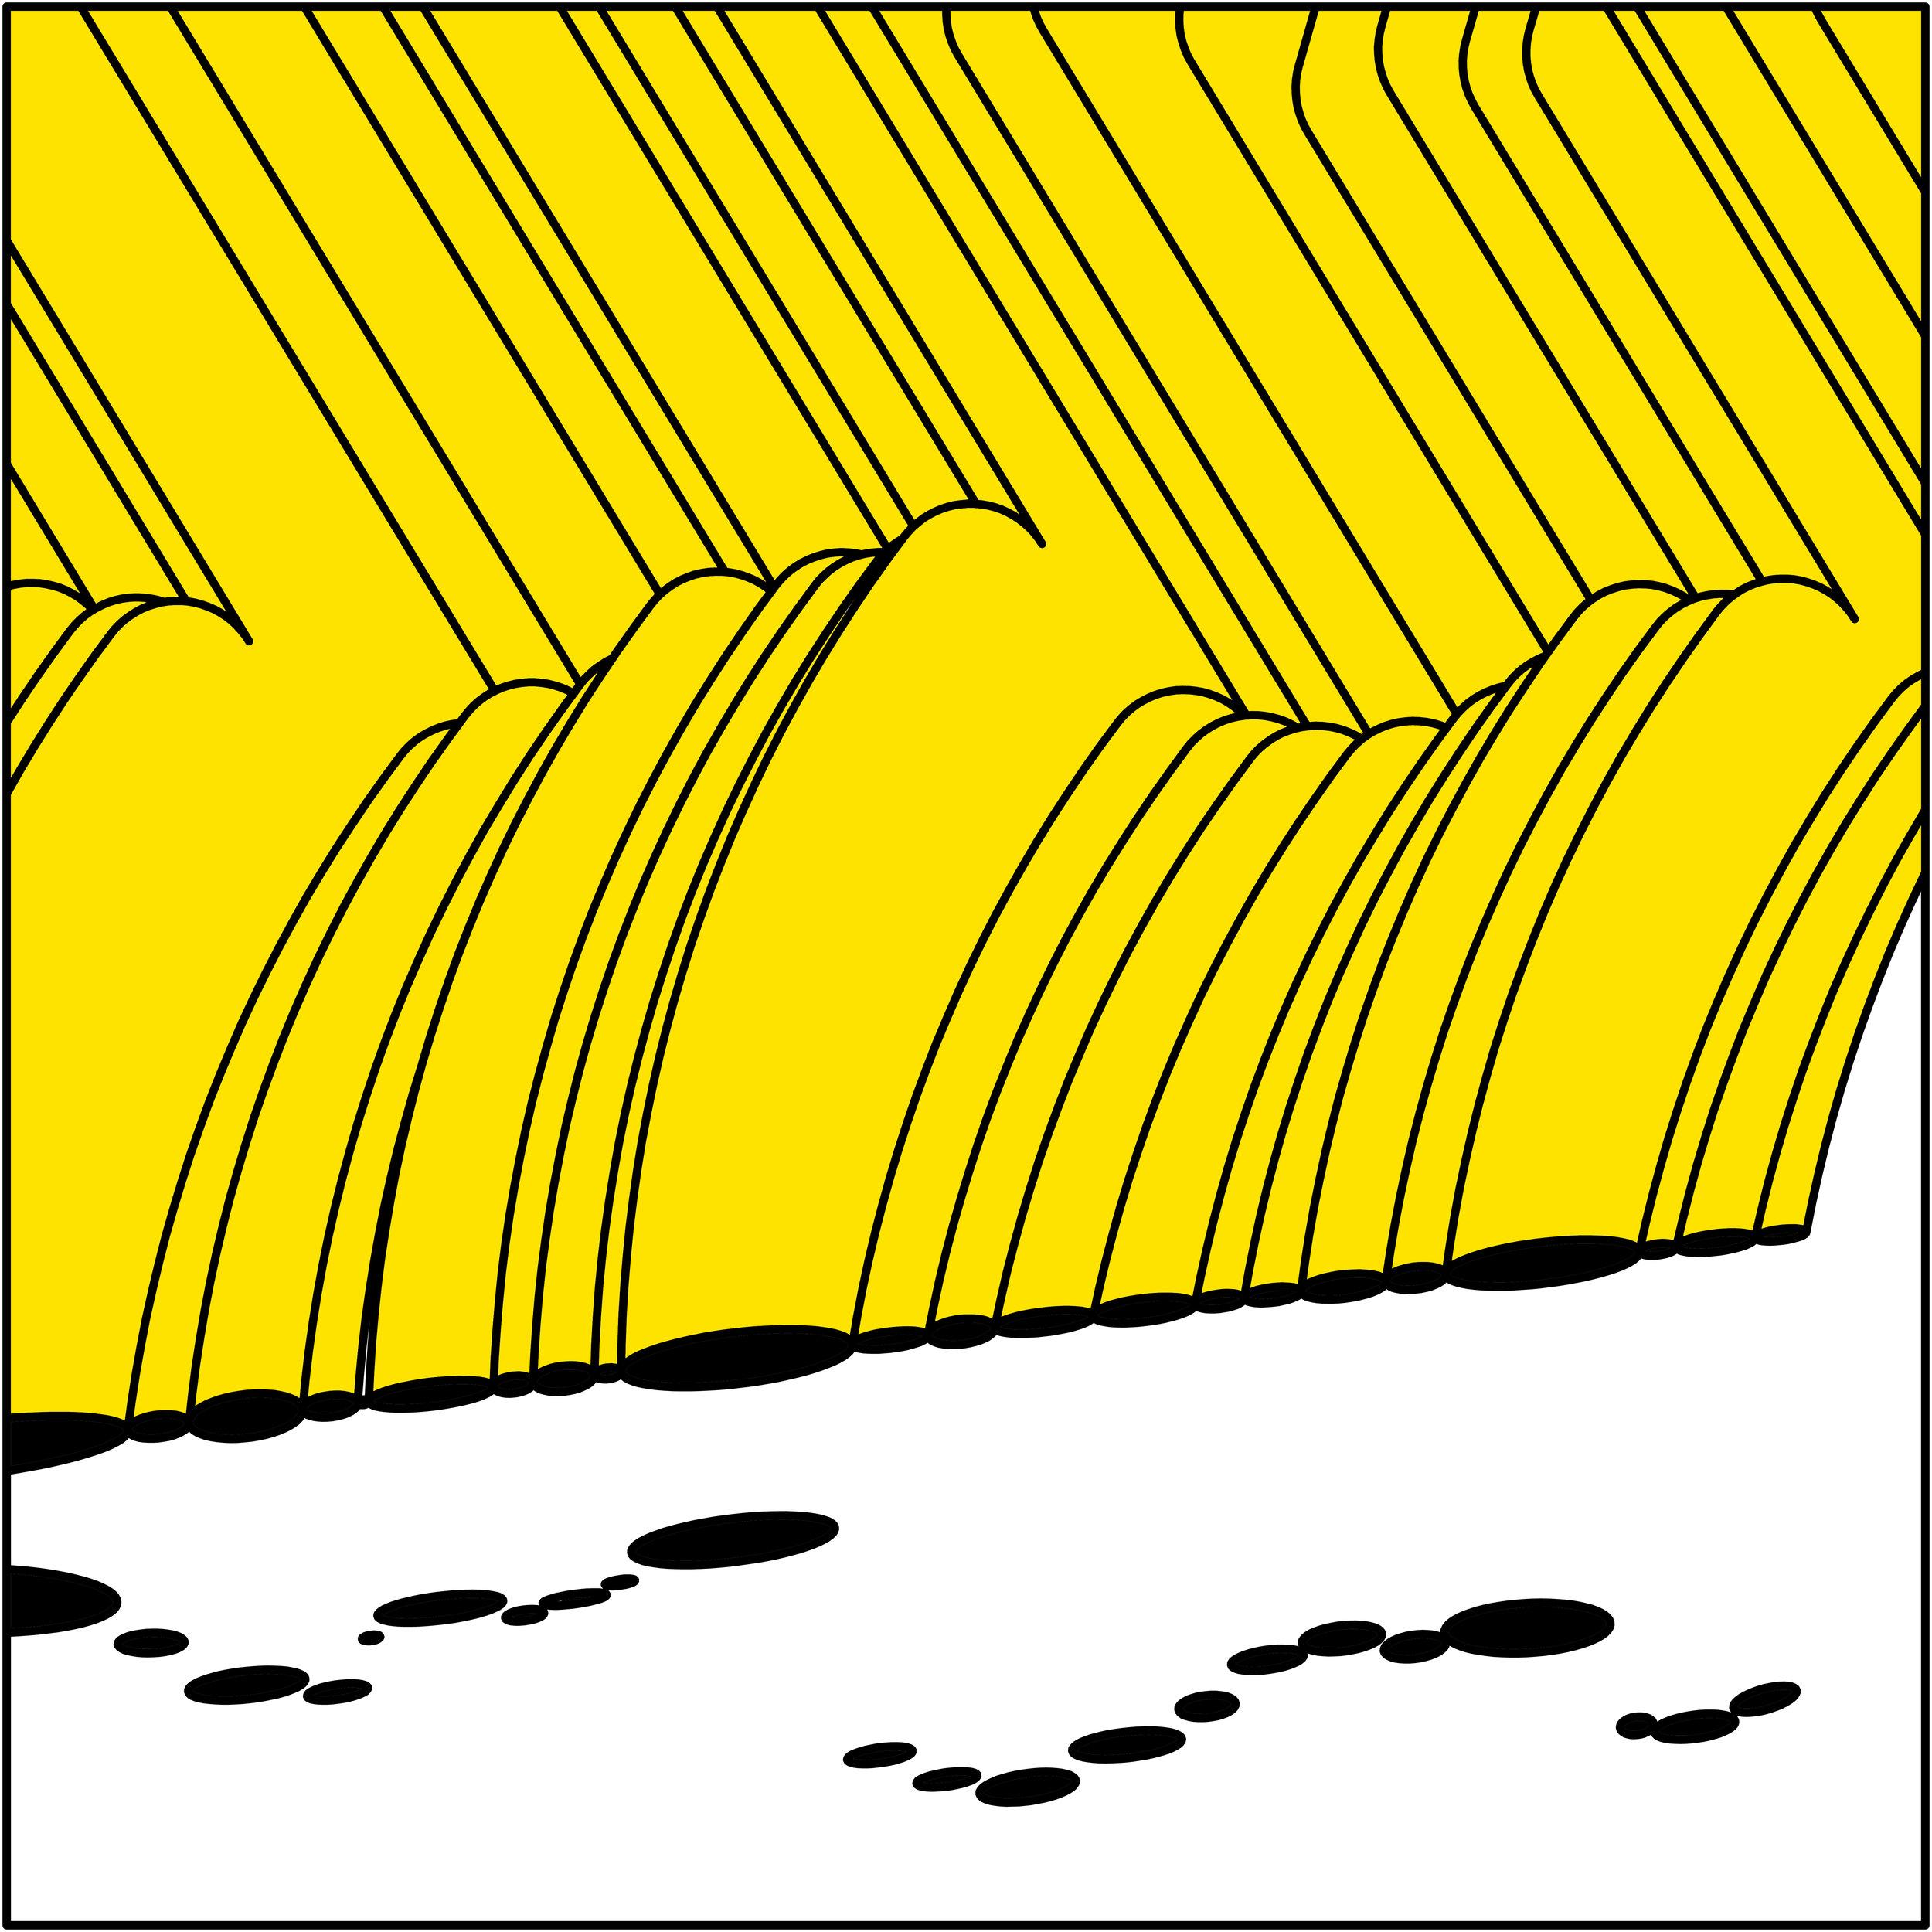 spaghetti yellow - 011.jpg